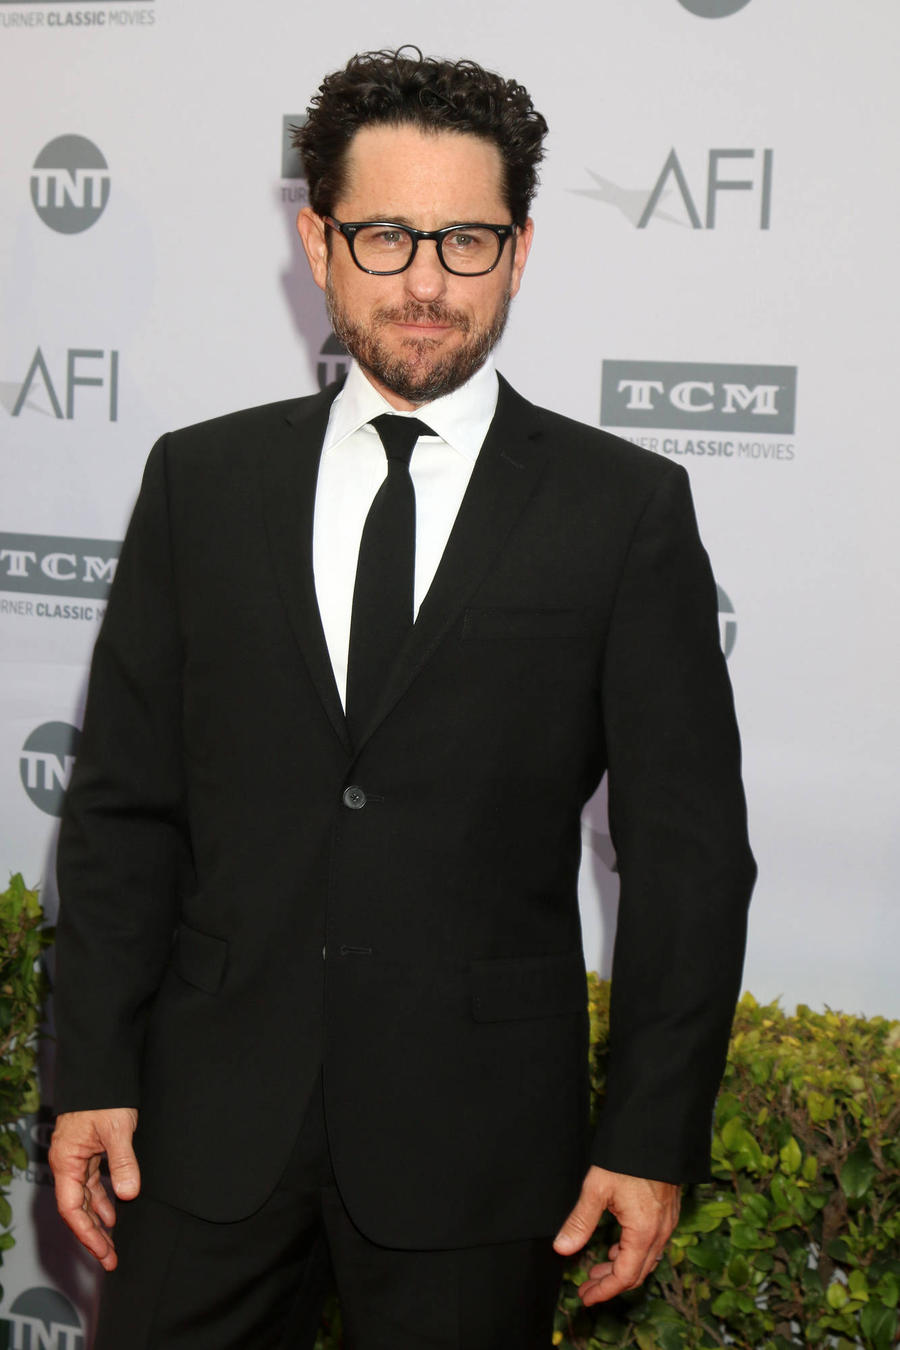 J.j. Abrams Won't Recast Anton Yelchin's Star Trek Role